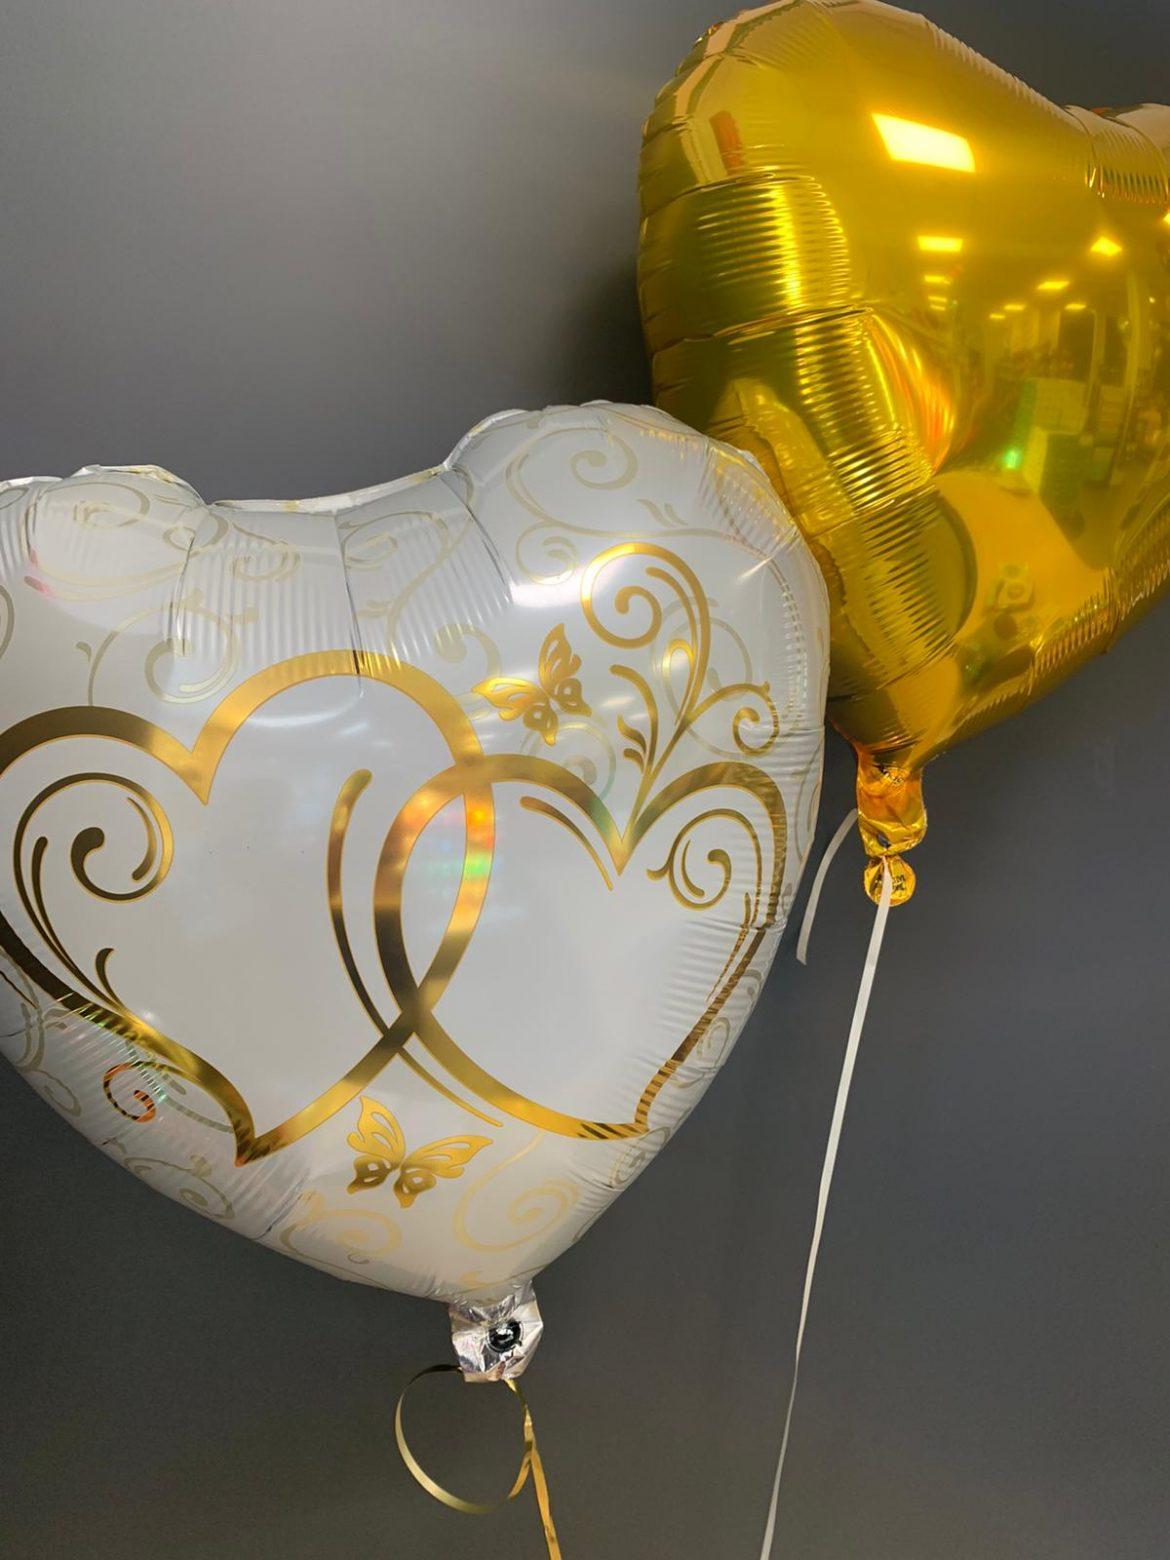 Ballon mit goldenen Herzen 1